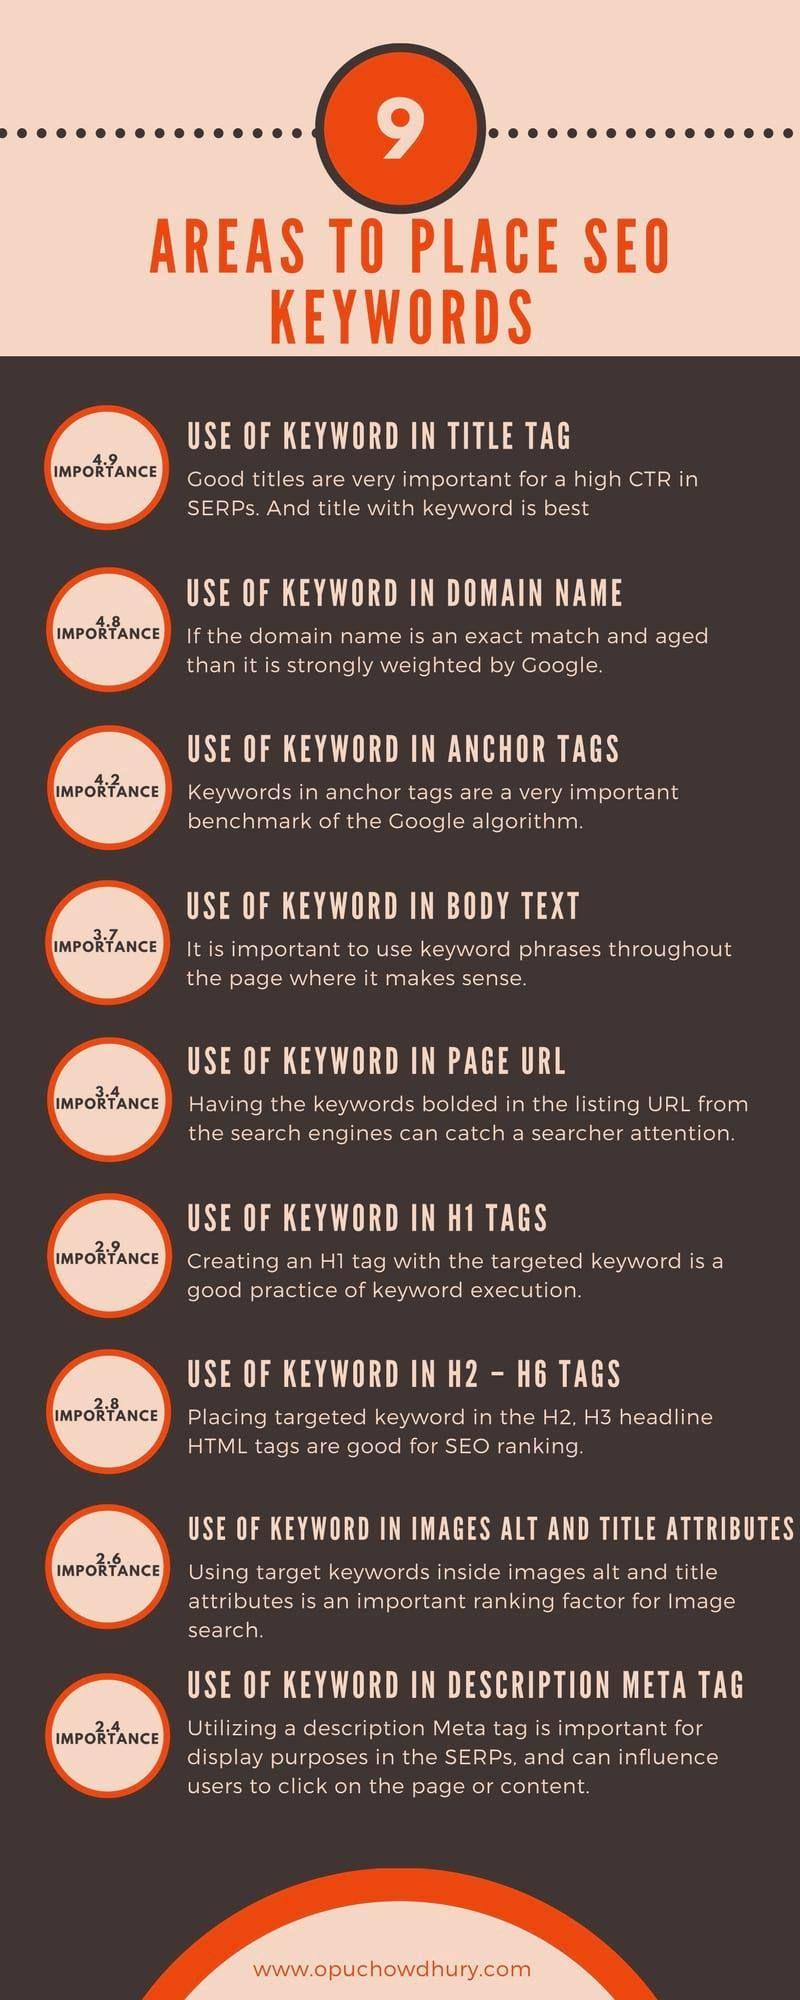 SEO Keywords: Definition | Seo keywords, Seo, Search engine